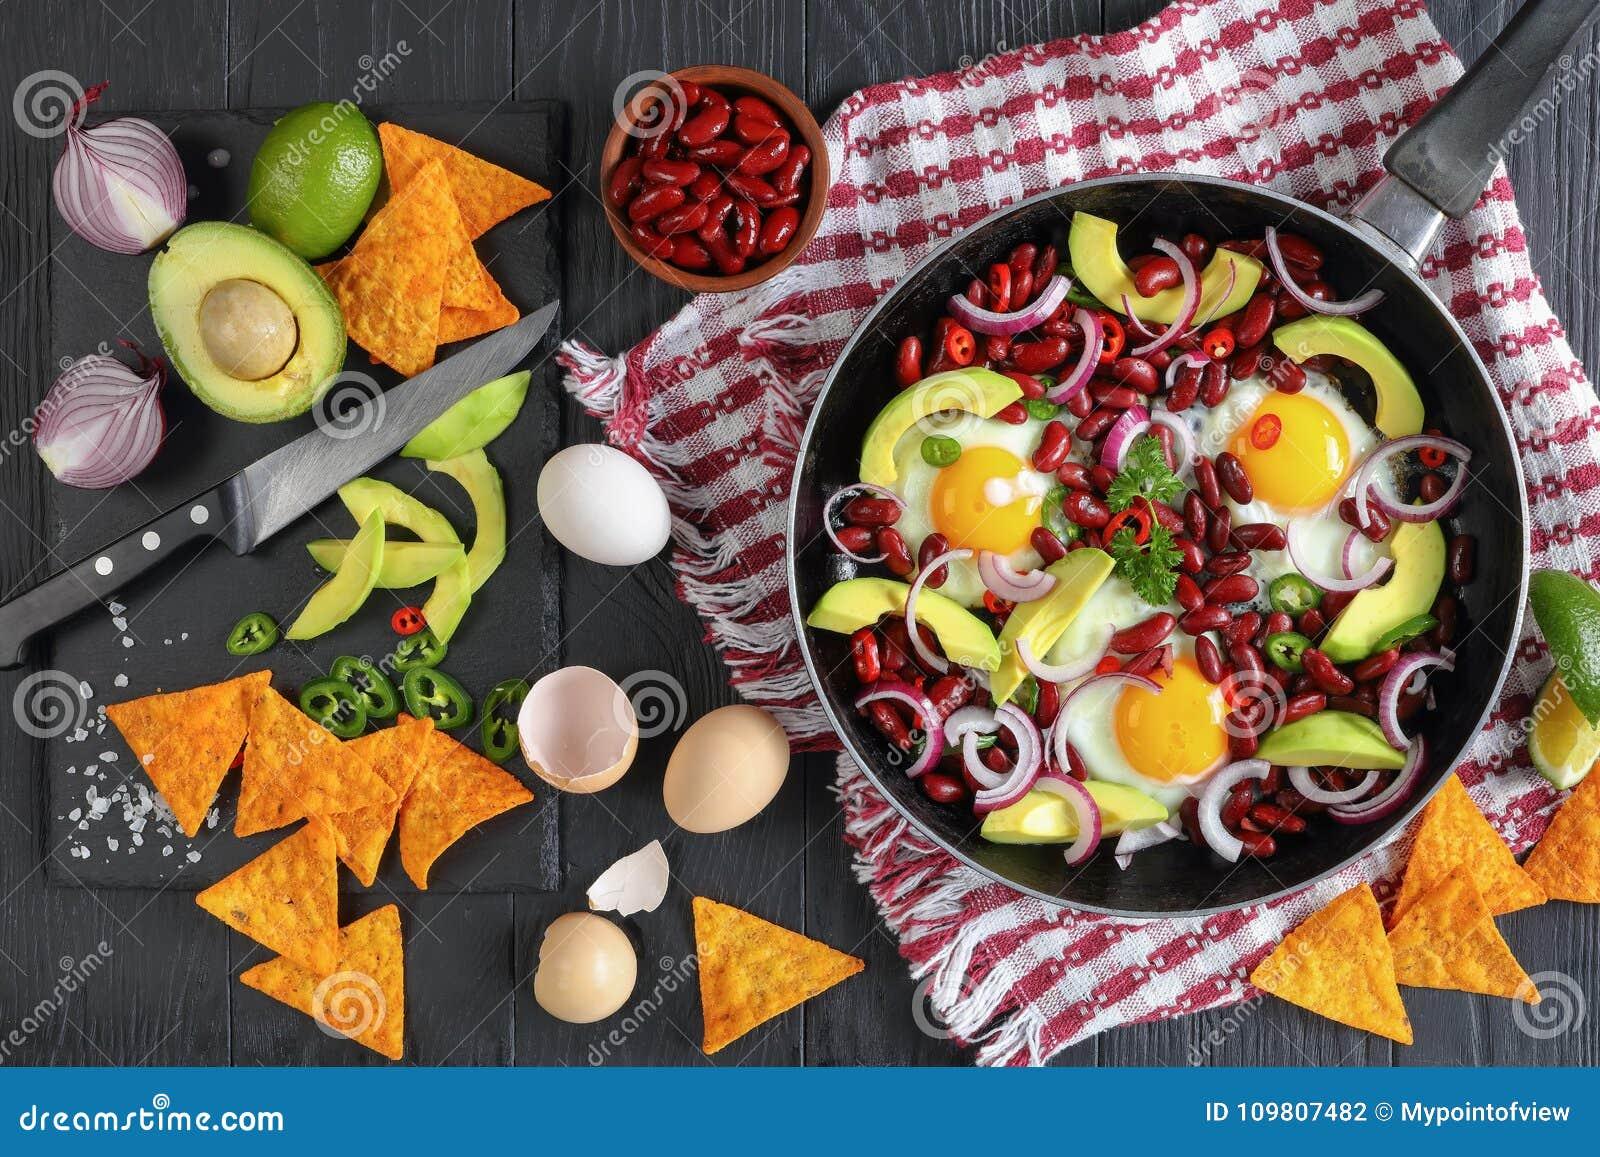 Mexican breakfast - fried eggs in skillet